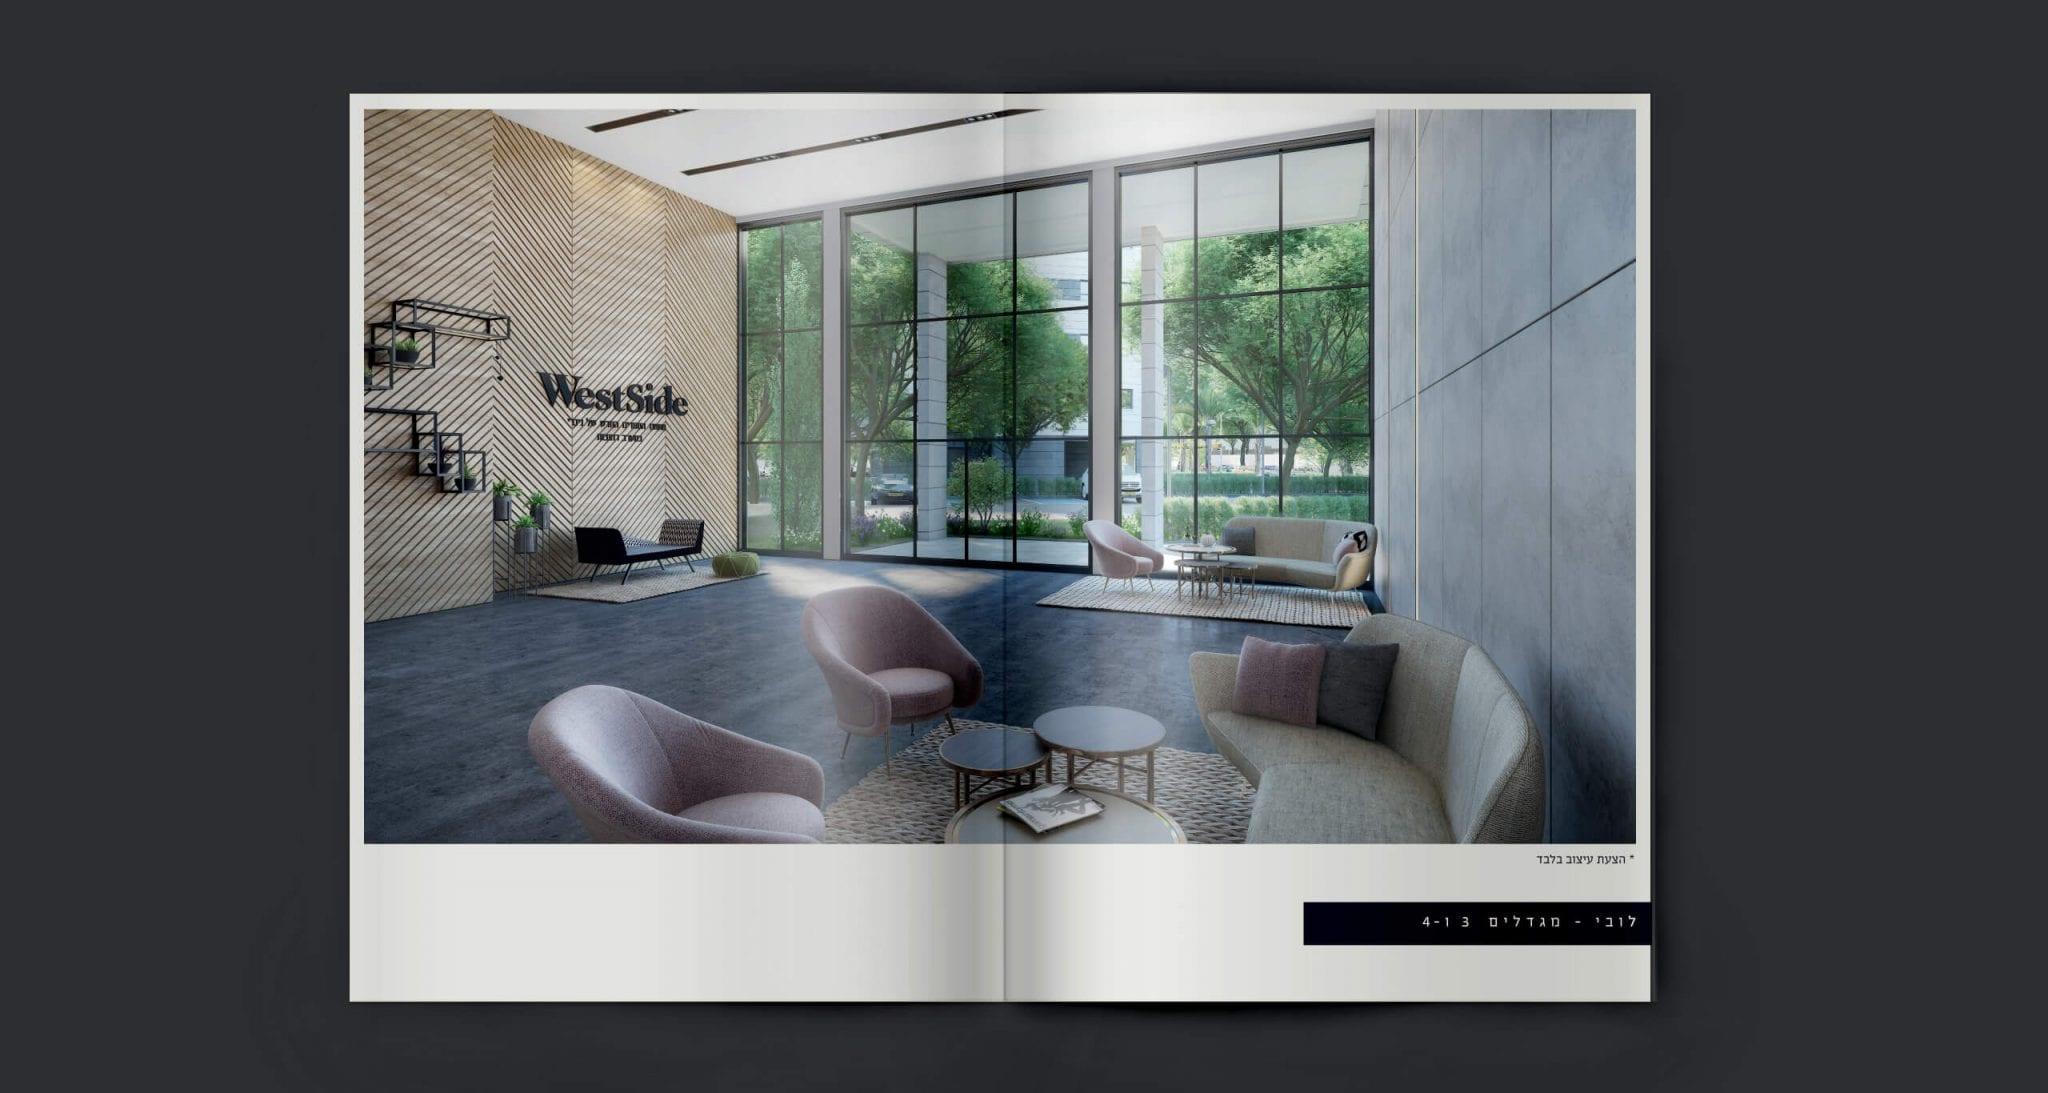 westside_2560x1366_15